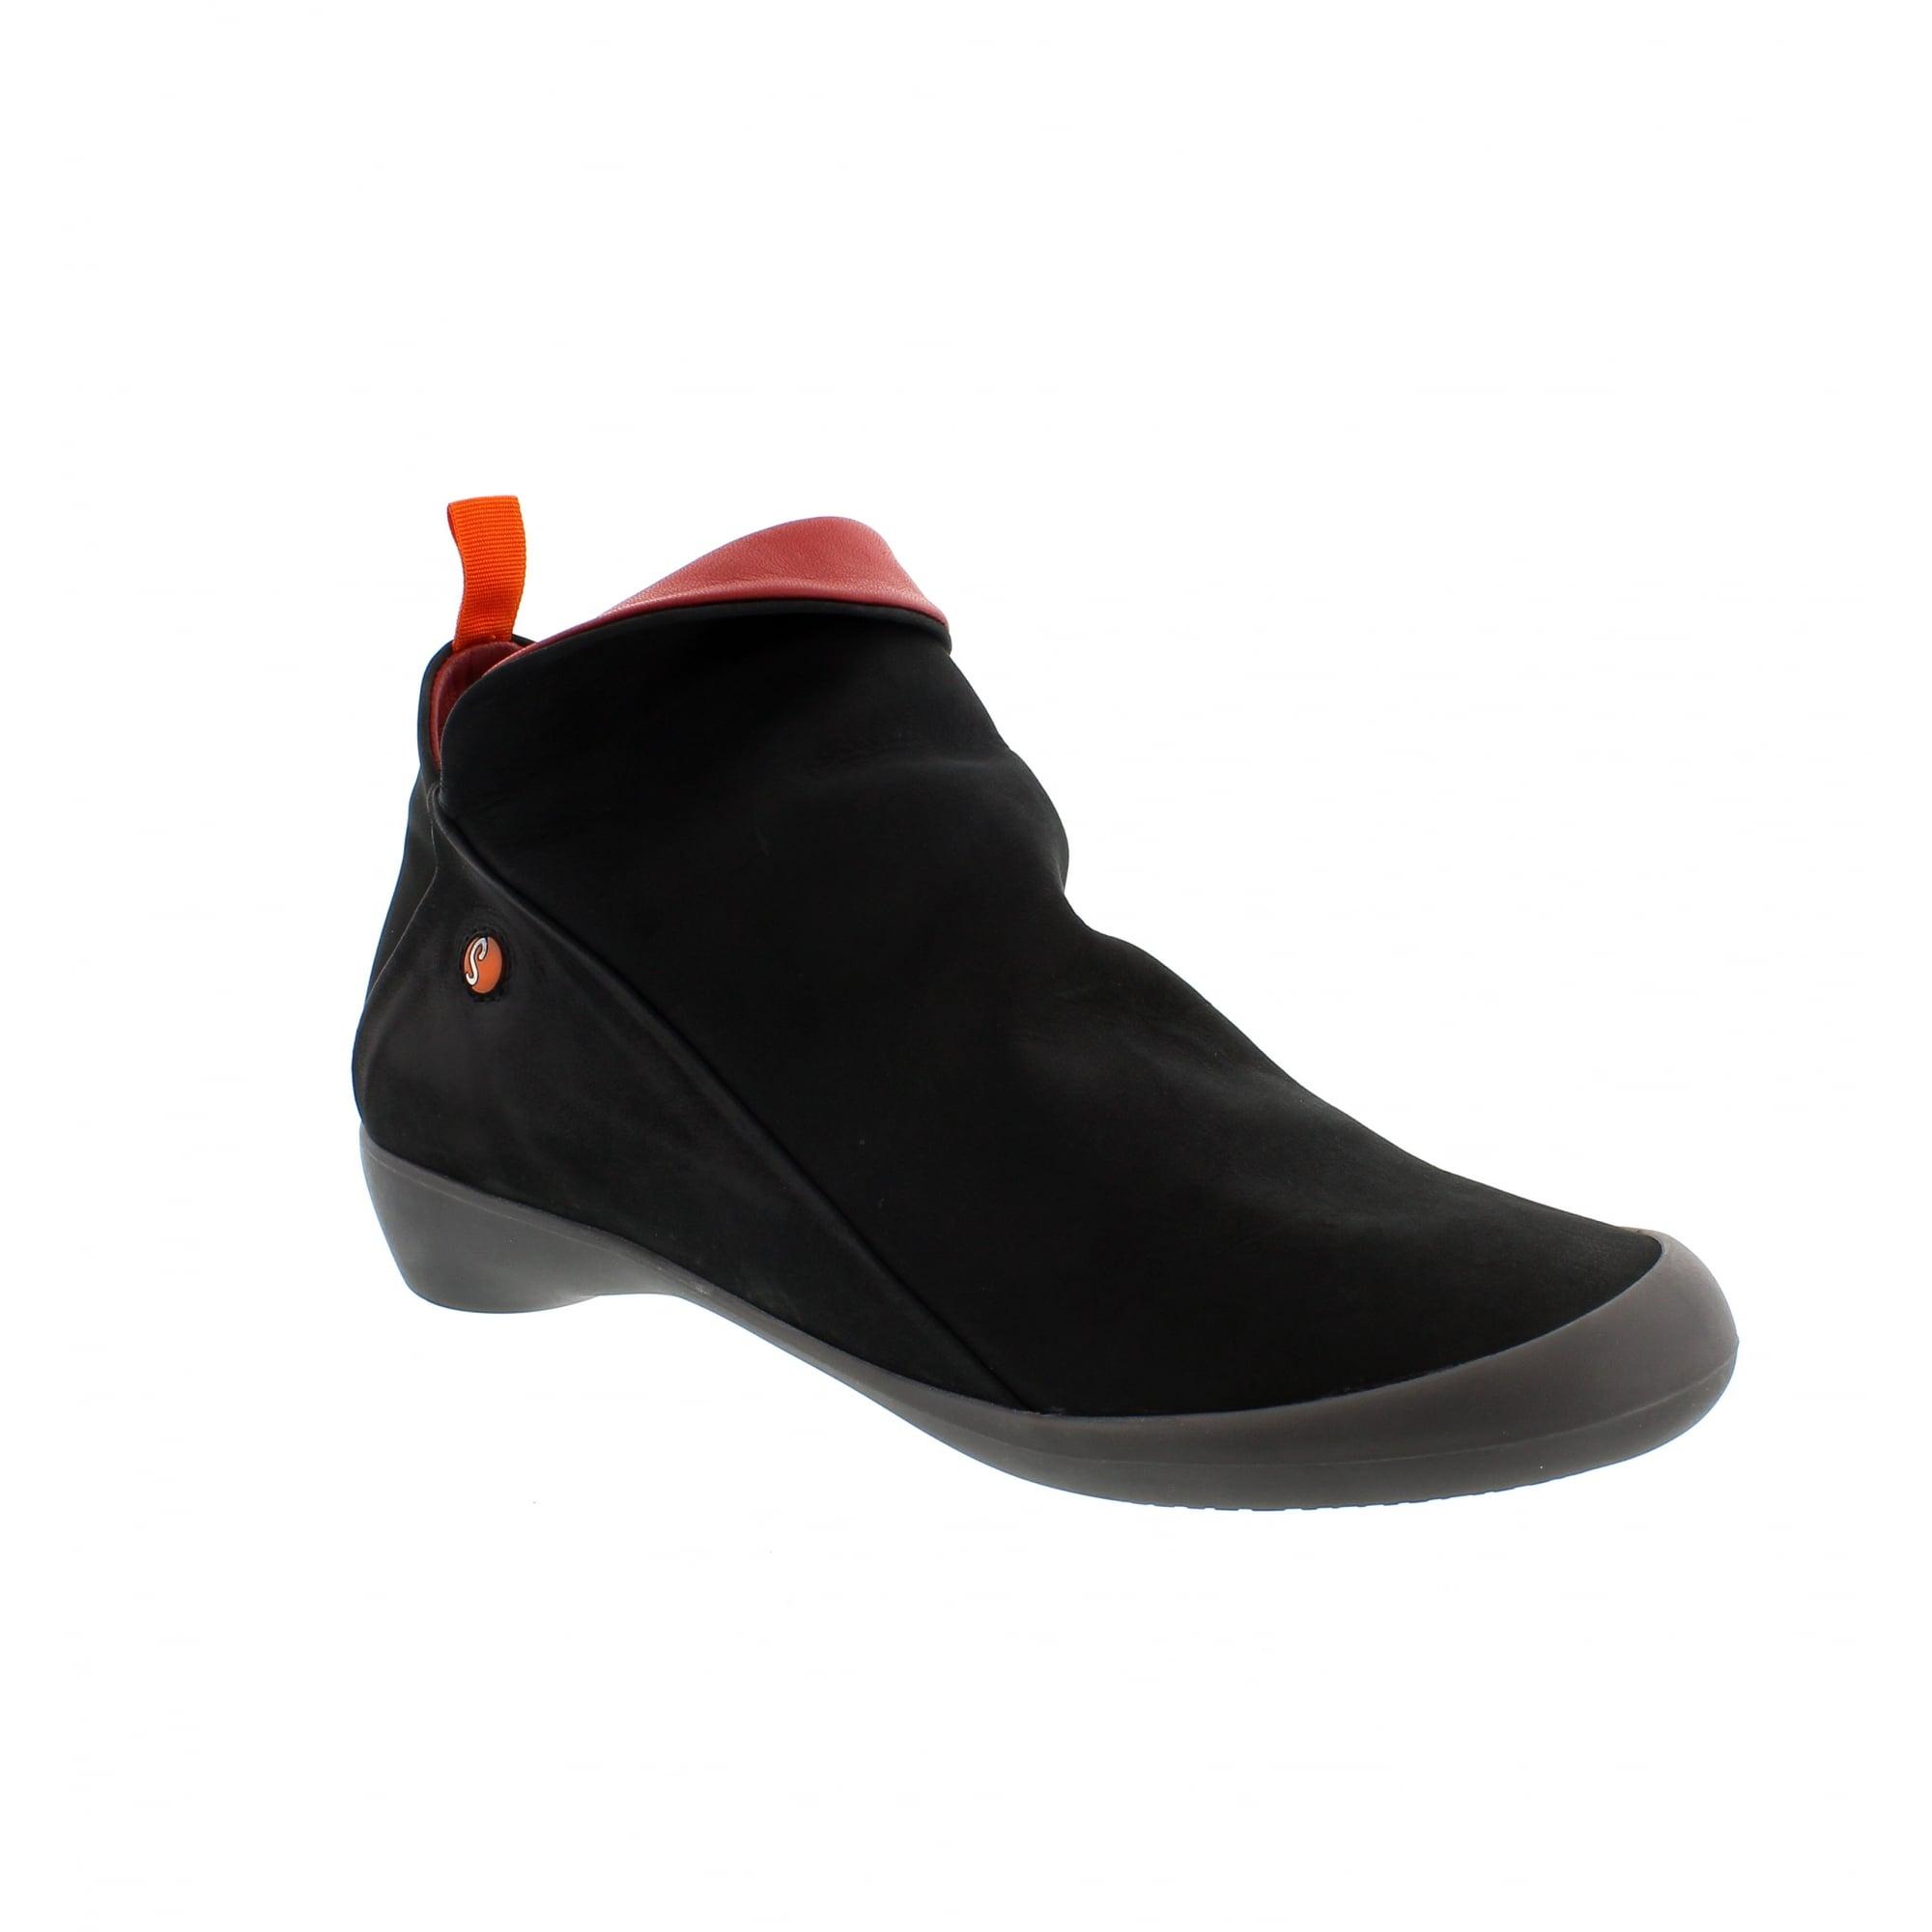 63b1bb9b37b Softinos Farah 900085-532 Womens Ankle Boots